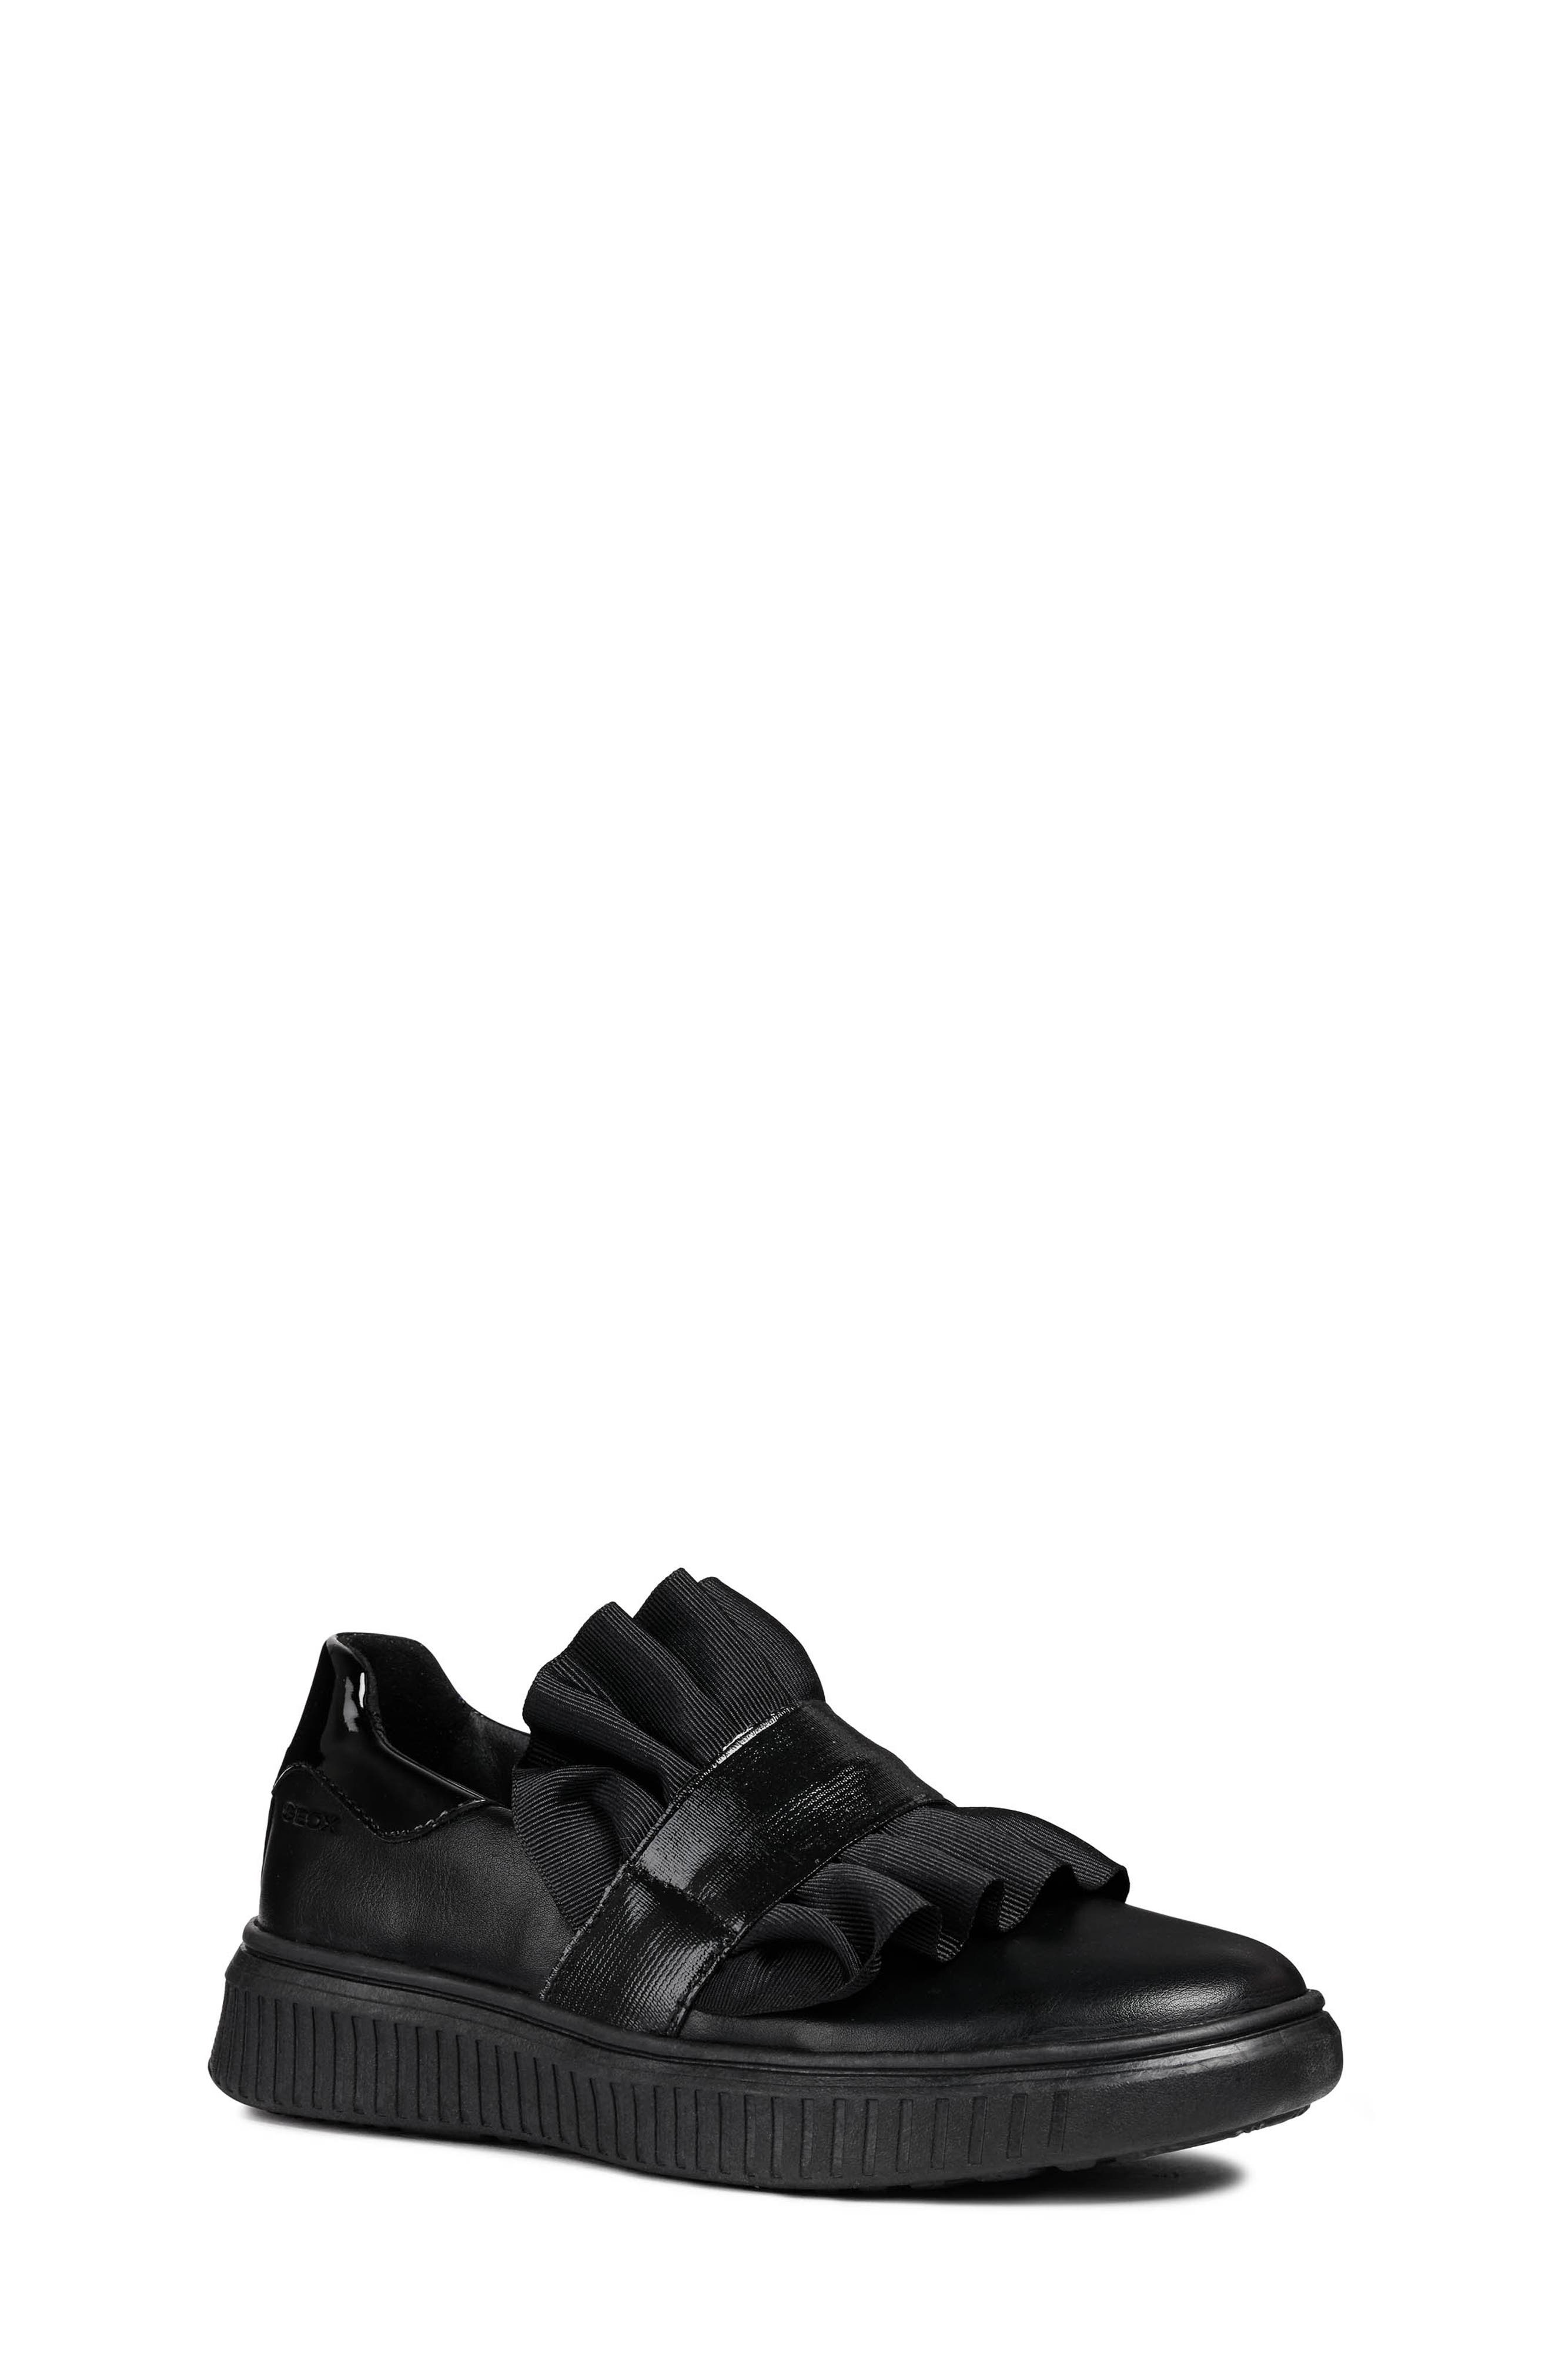 Disco Mix Slip-On Sneaker,                         Main,                         color, BLACK